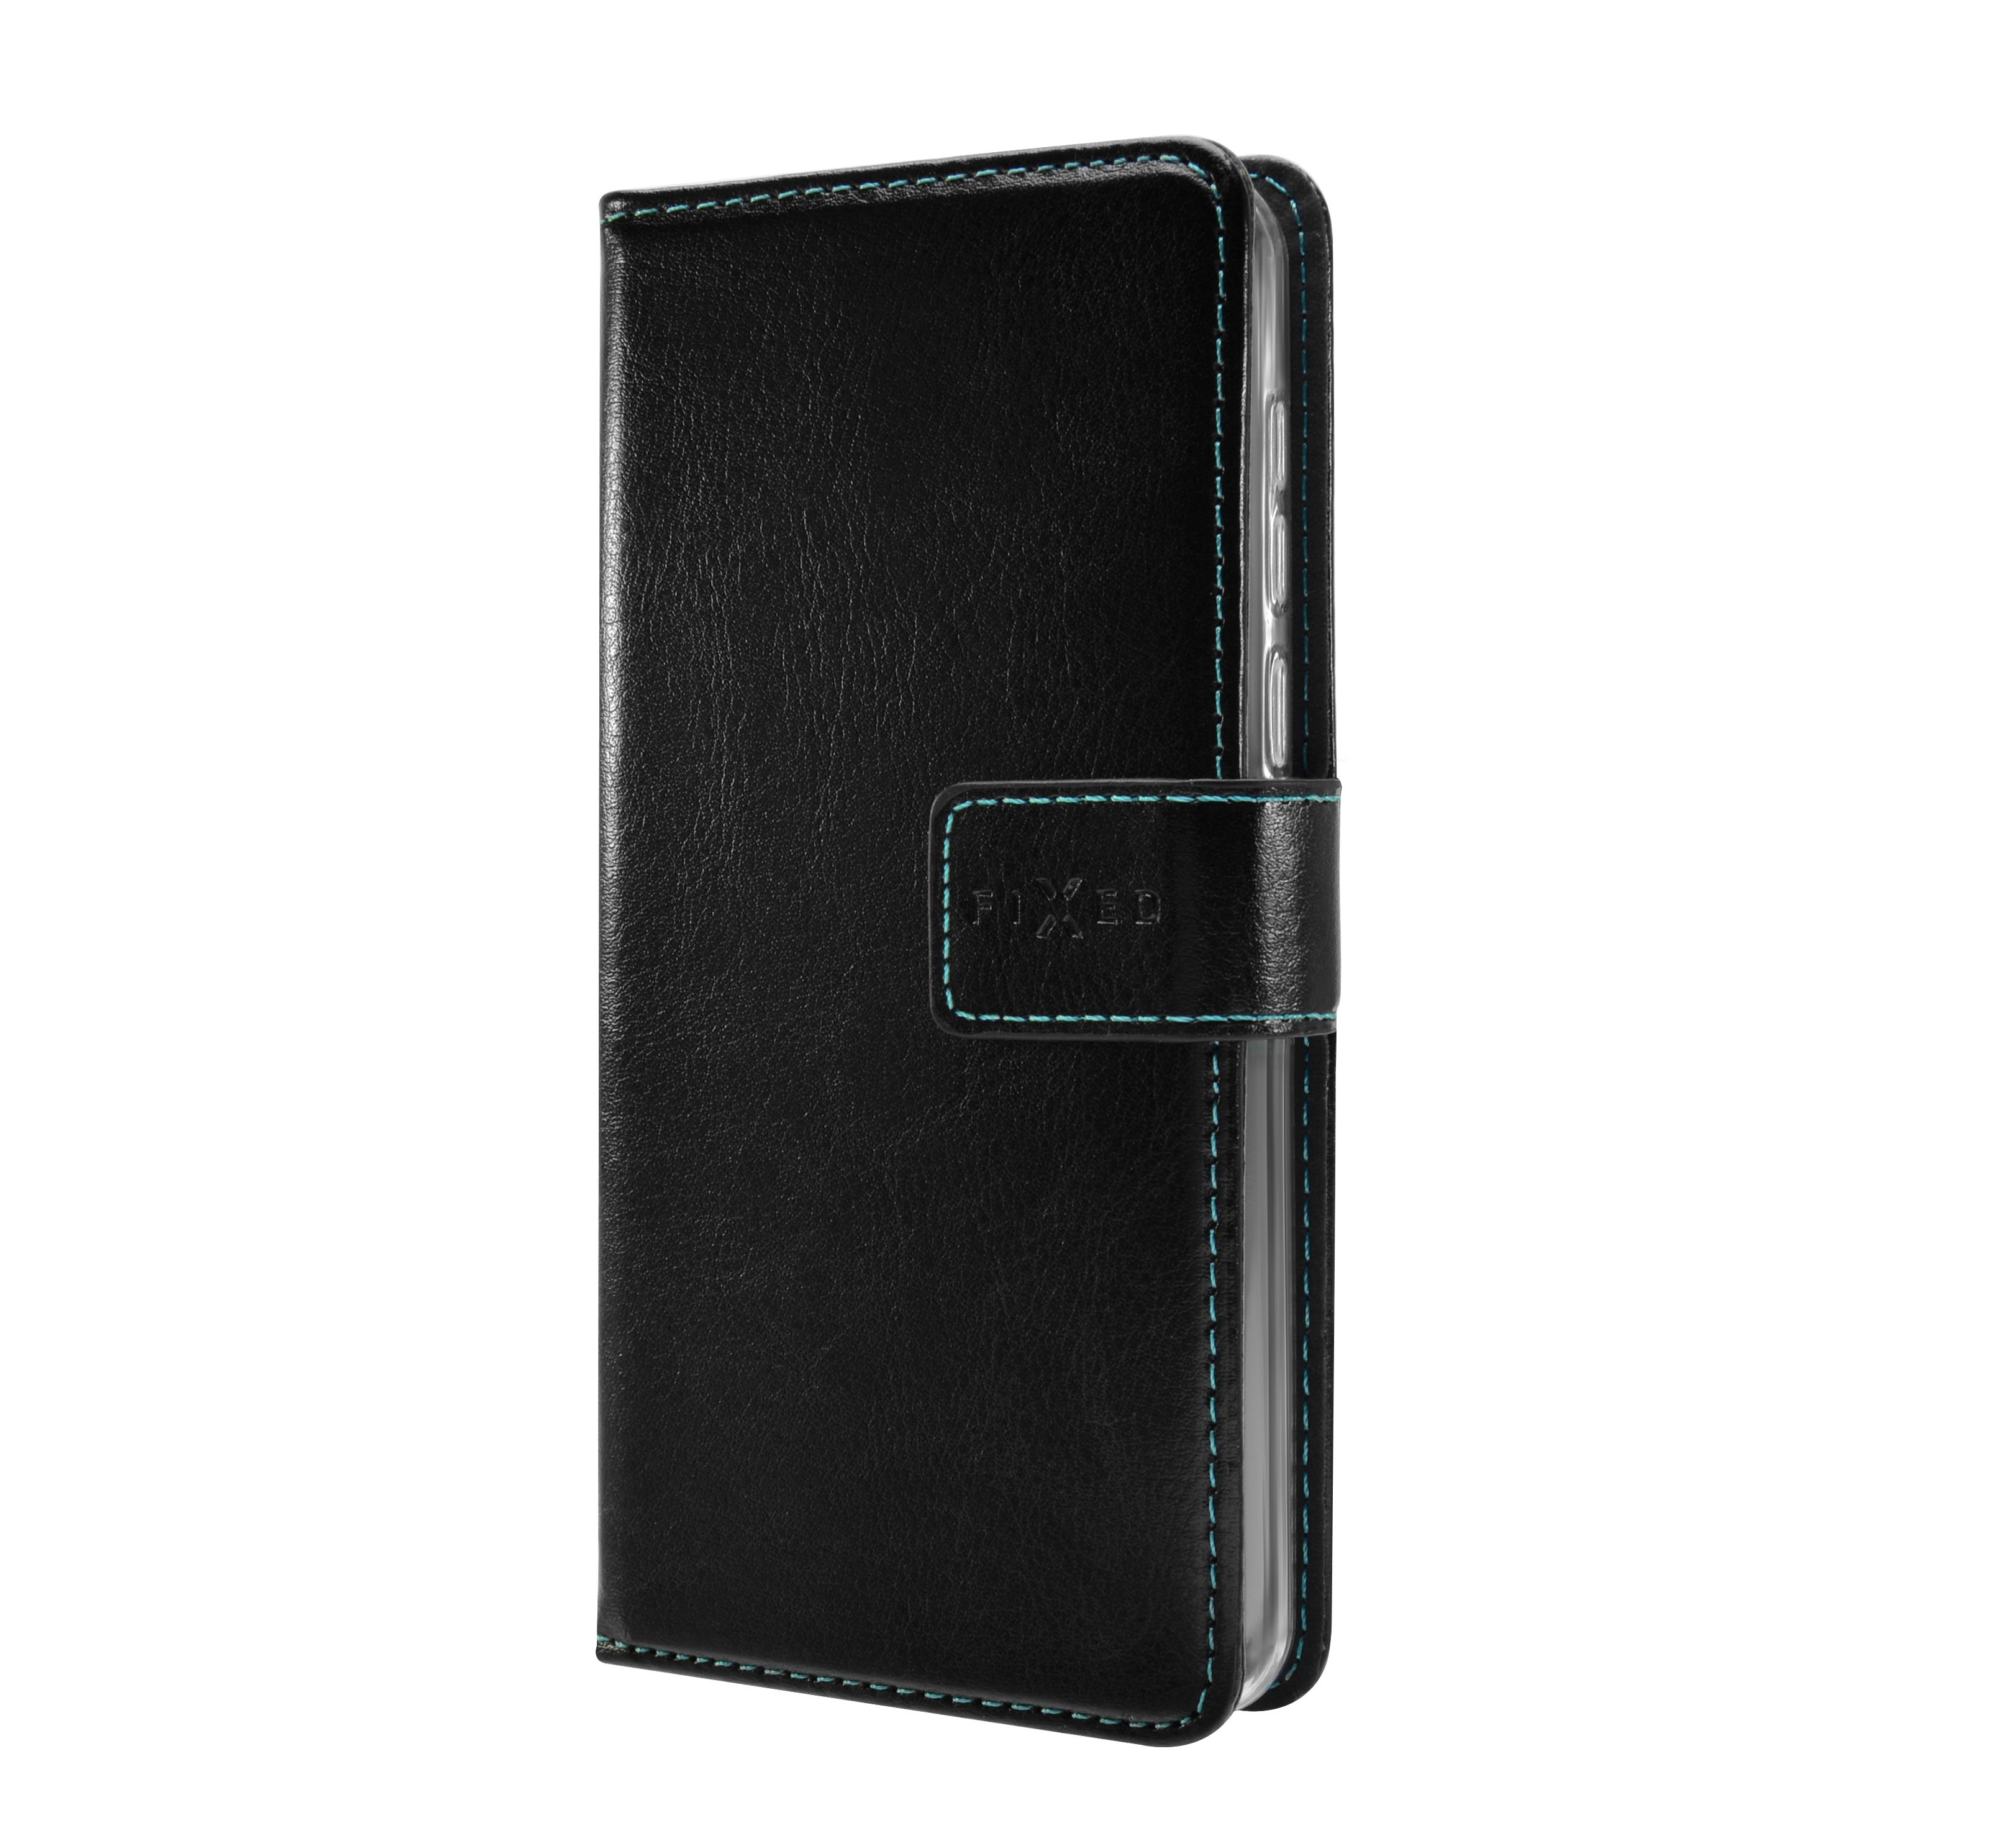 Pouzdro typu kniha FIXED Opus pro Motorola E6 Plus, černé